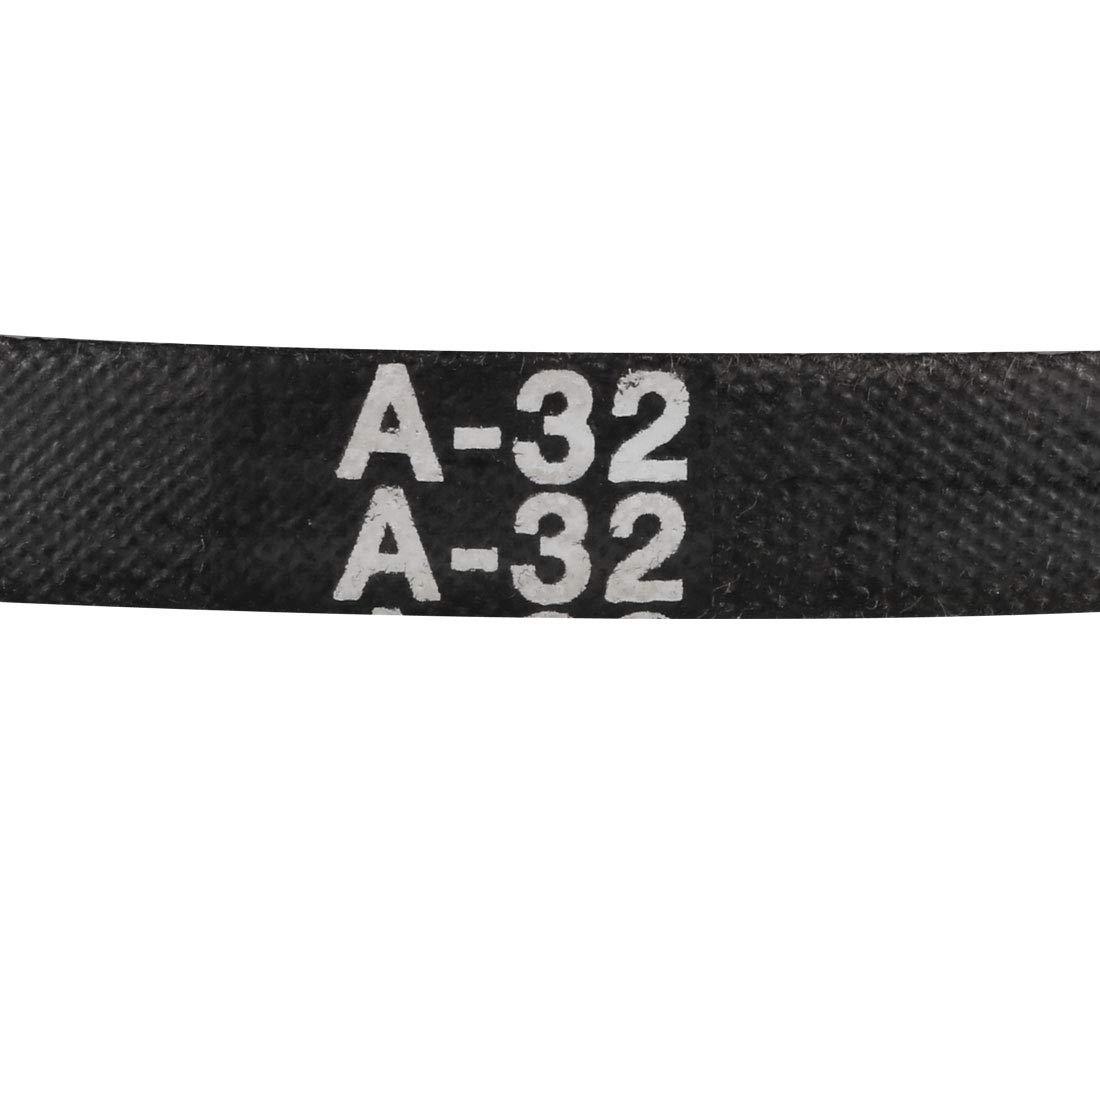 uxcell A-40 Drive V-Belt Girth 40-inch Industrial Power Rubber Transmission Belt